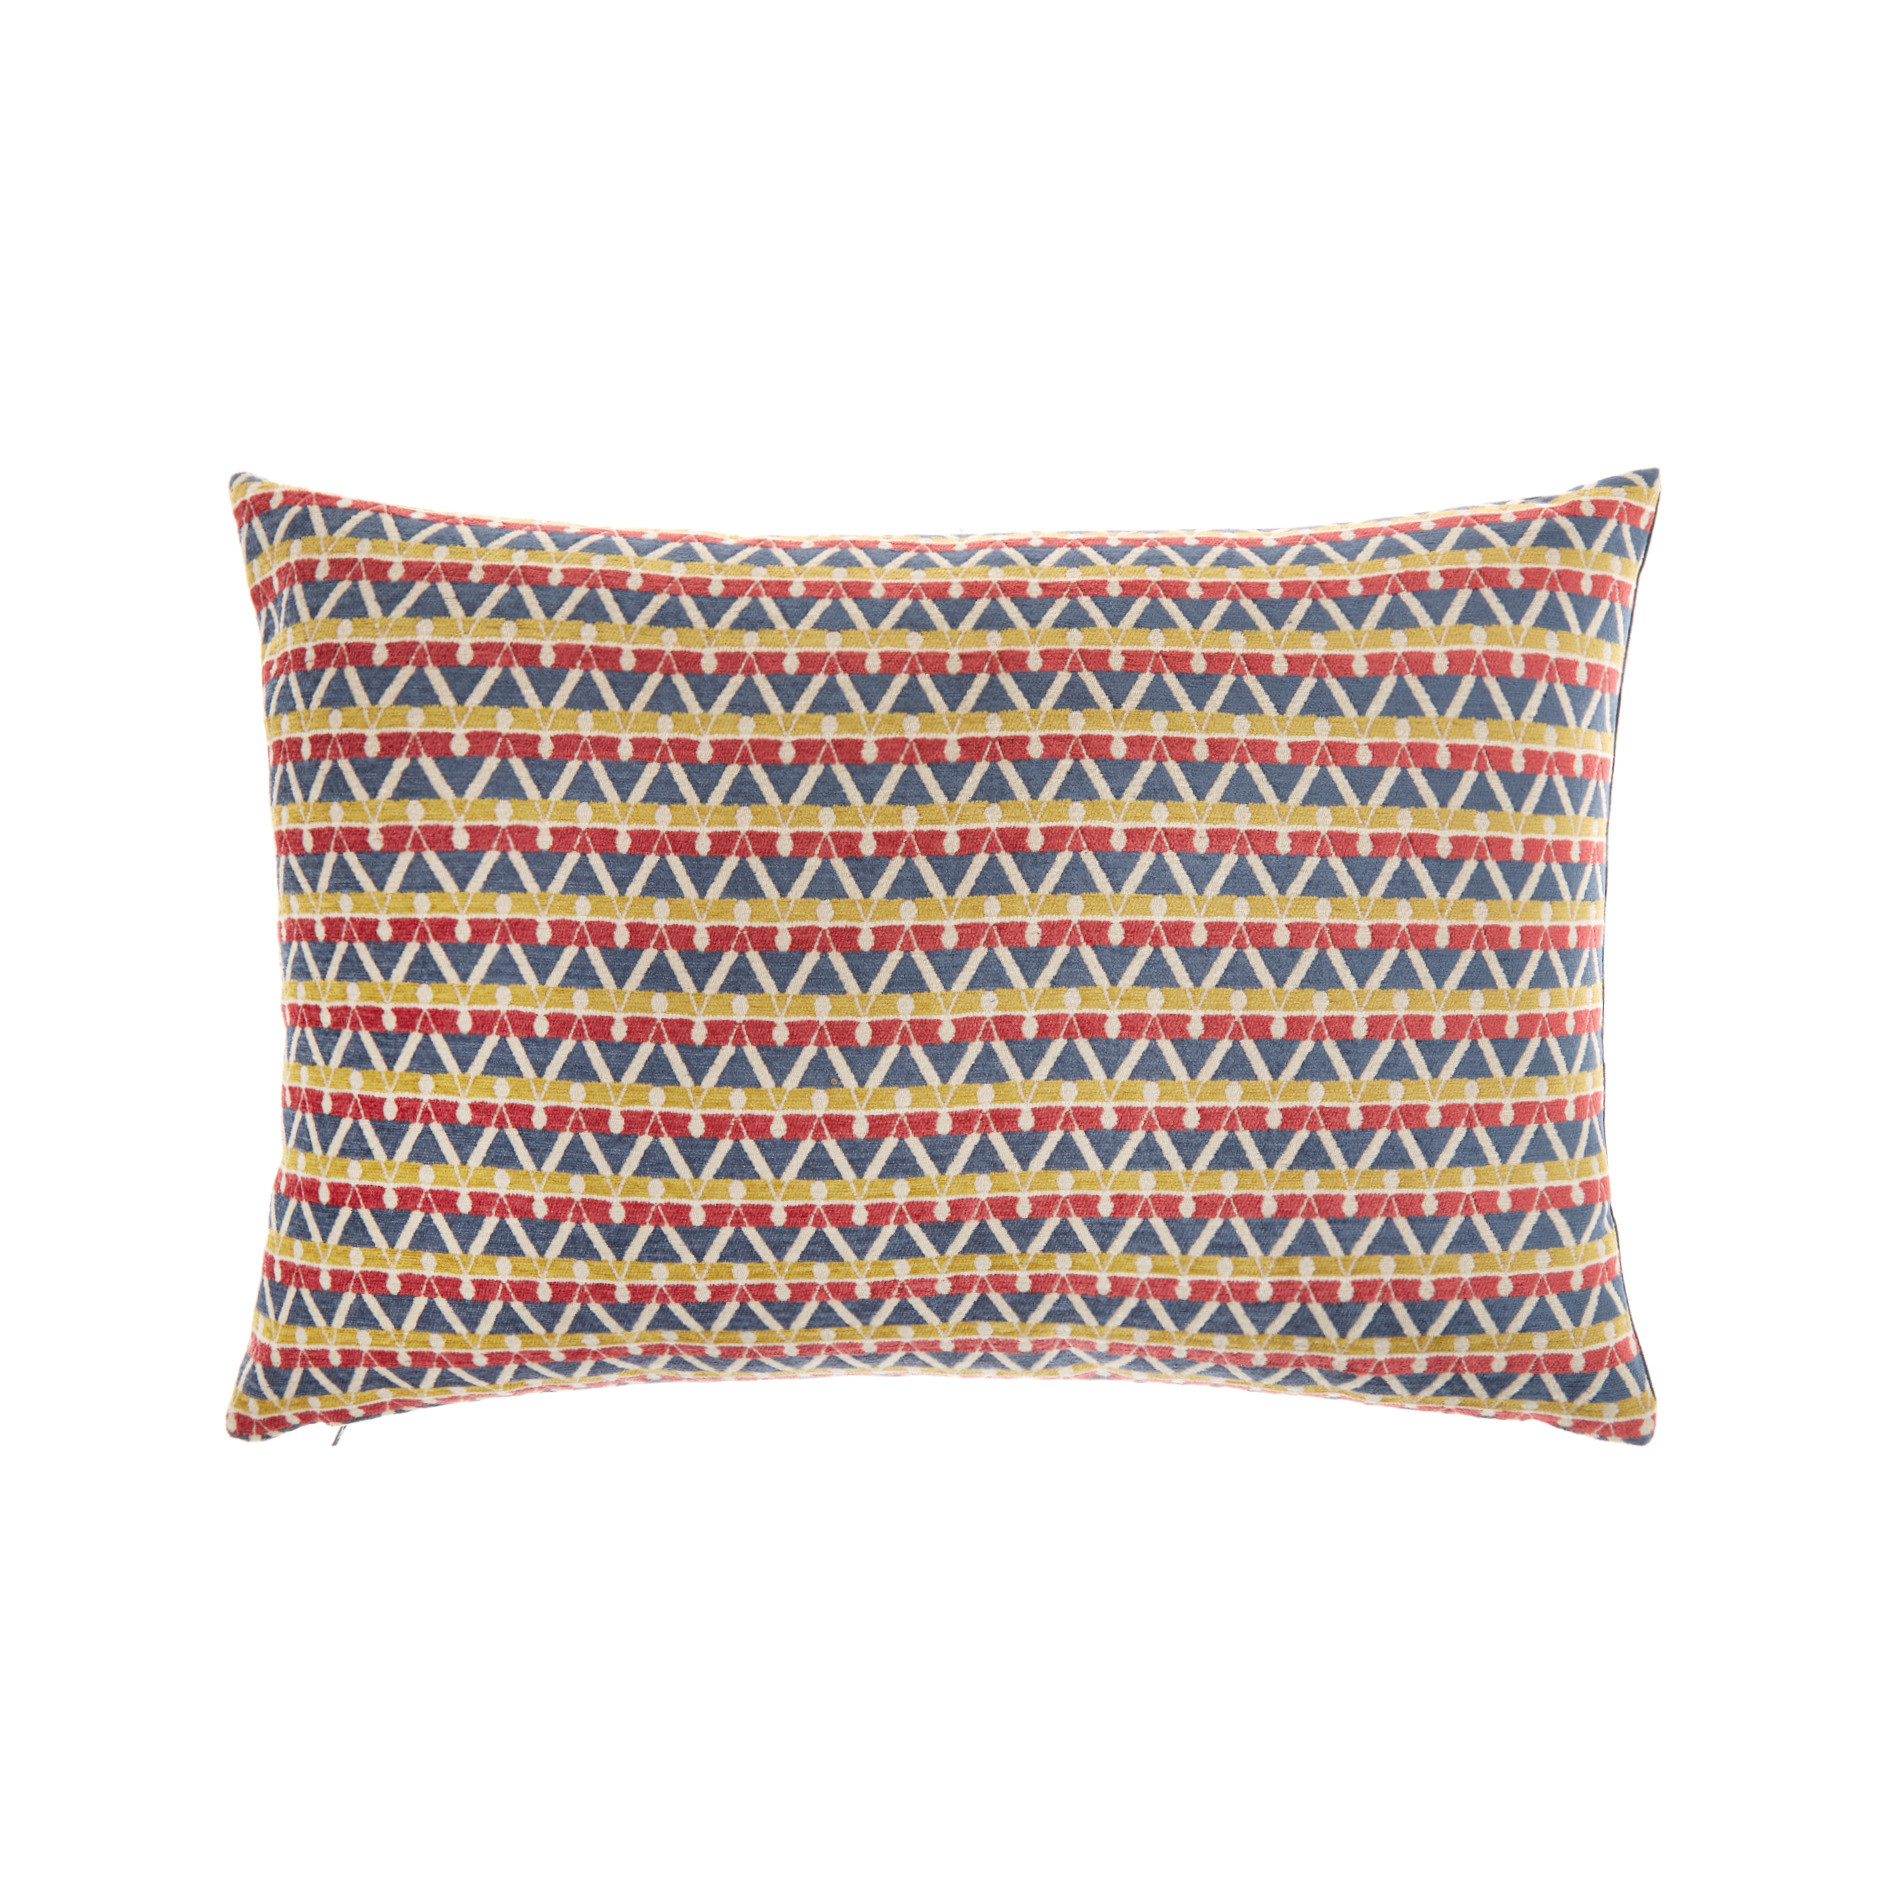 Cuscino jacquard motivo geometrico 35x55cm, Multicolor, large image number 0